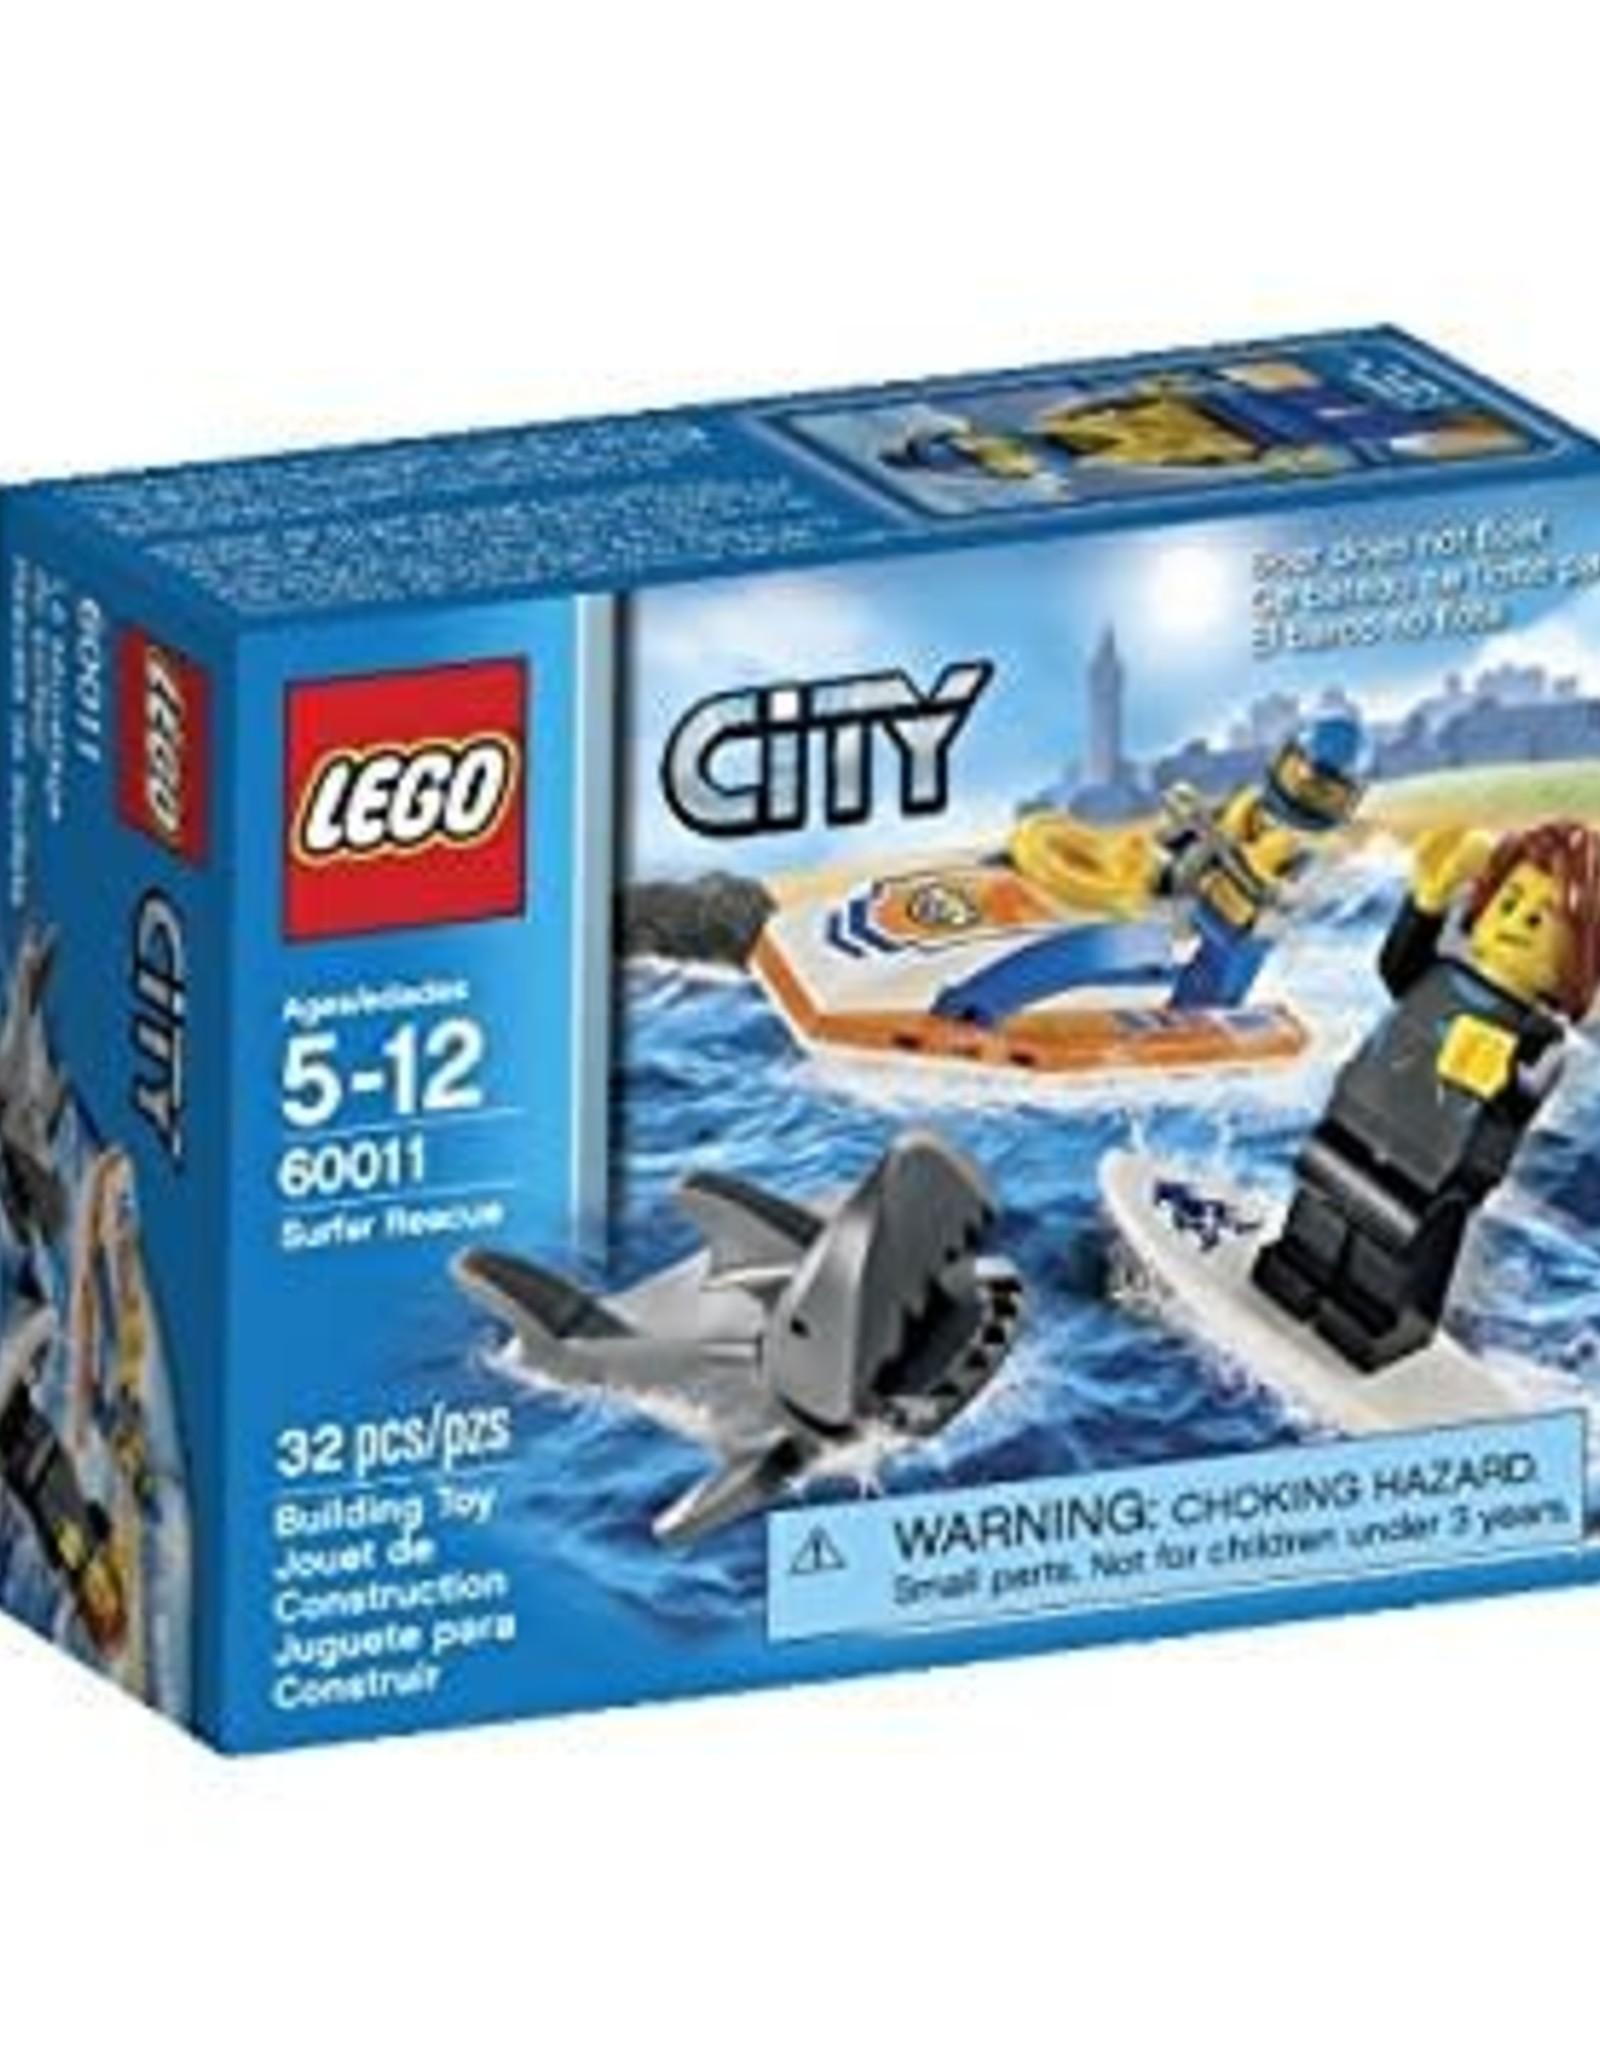 LEGO LEGO 60011 Surfer Rescue CITY